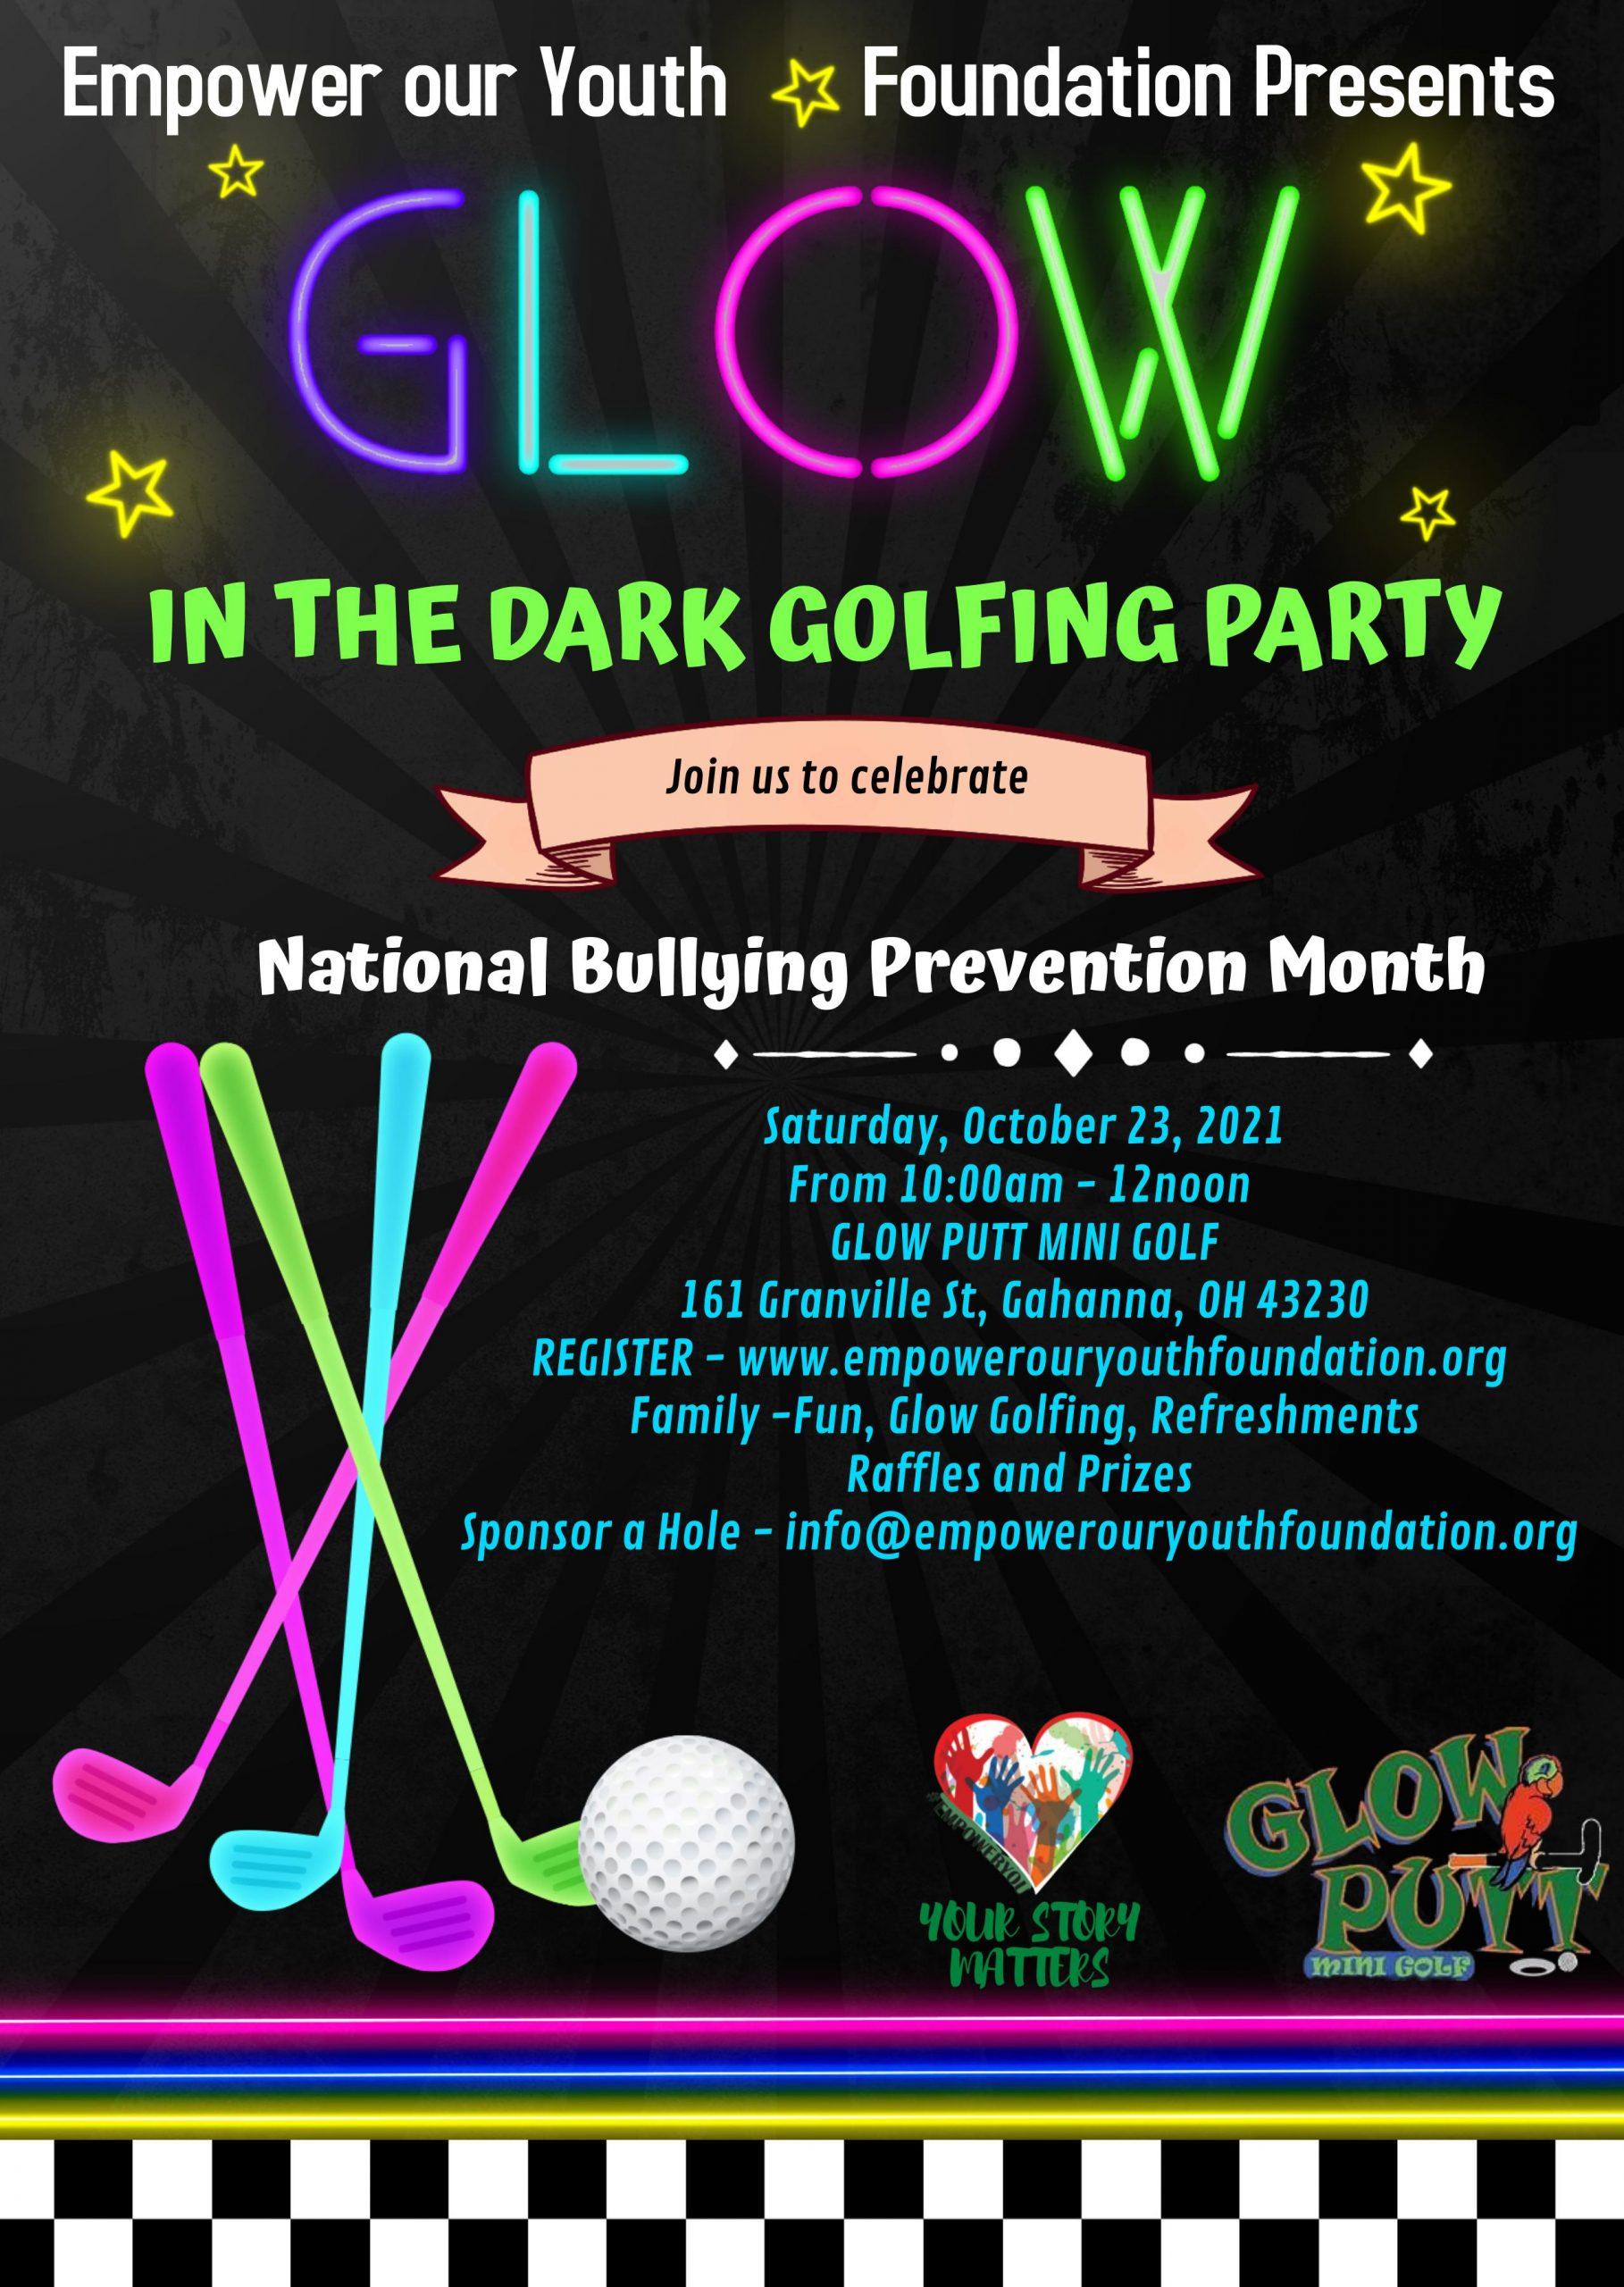 Glow in the Dark Golfing Party